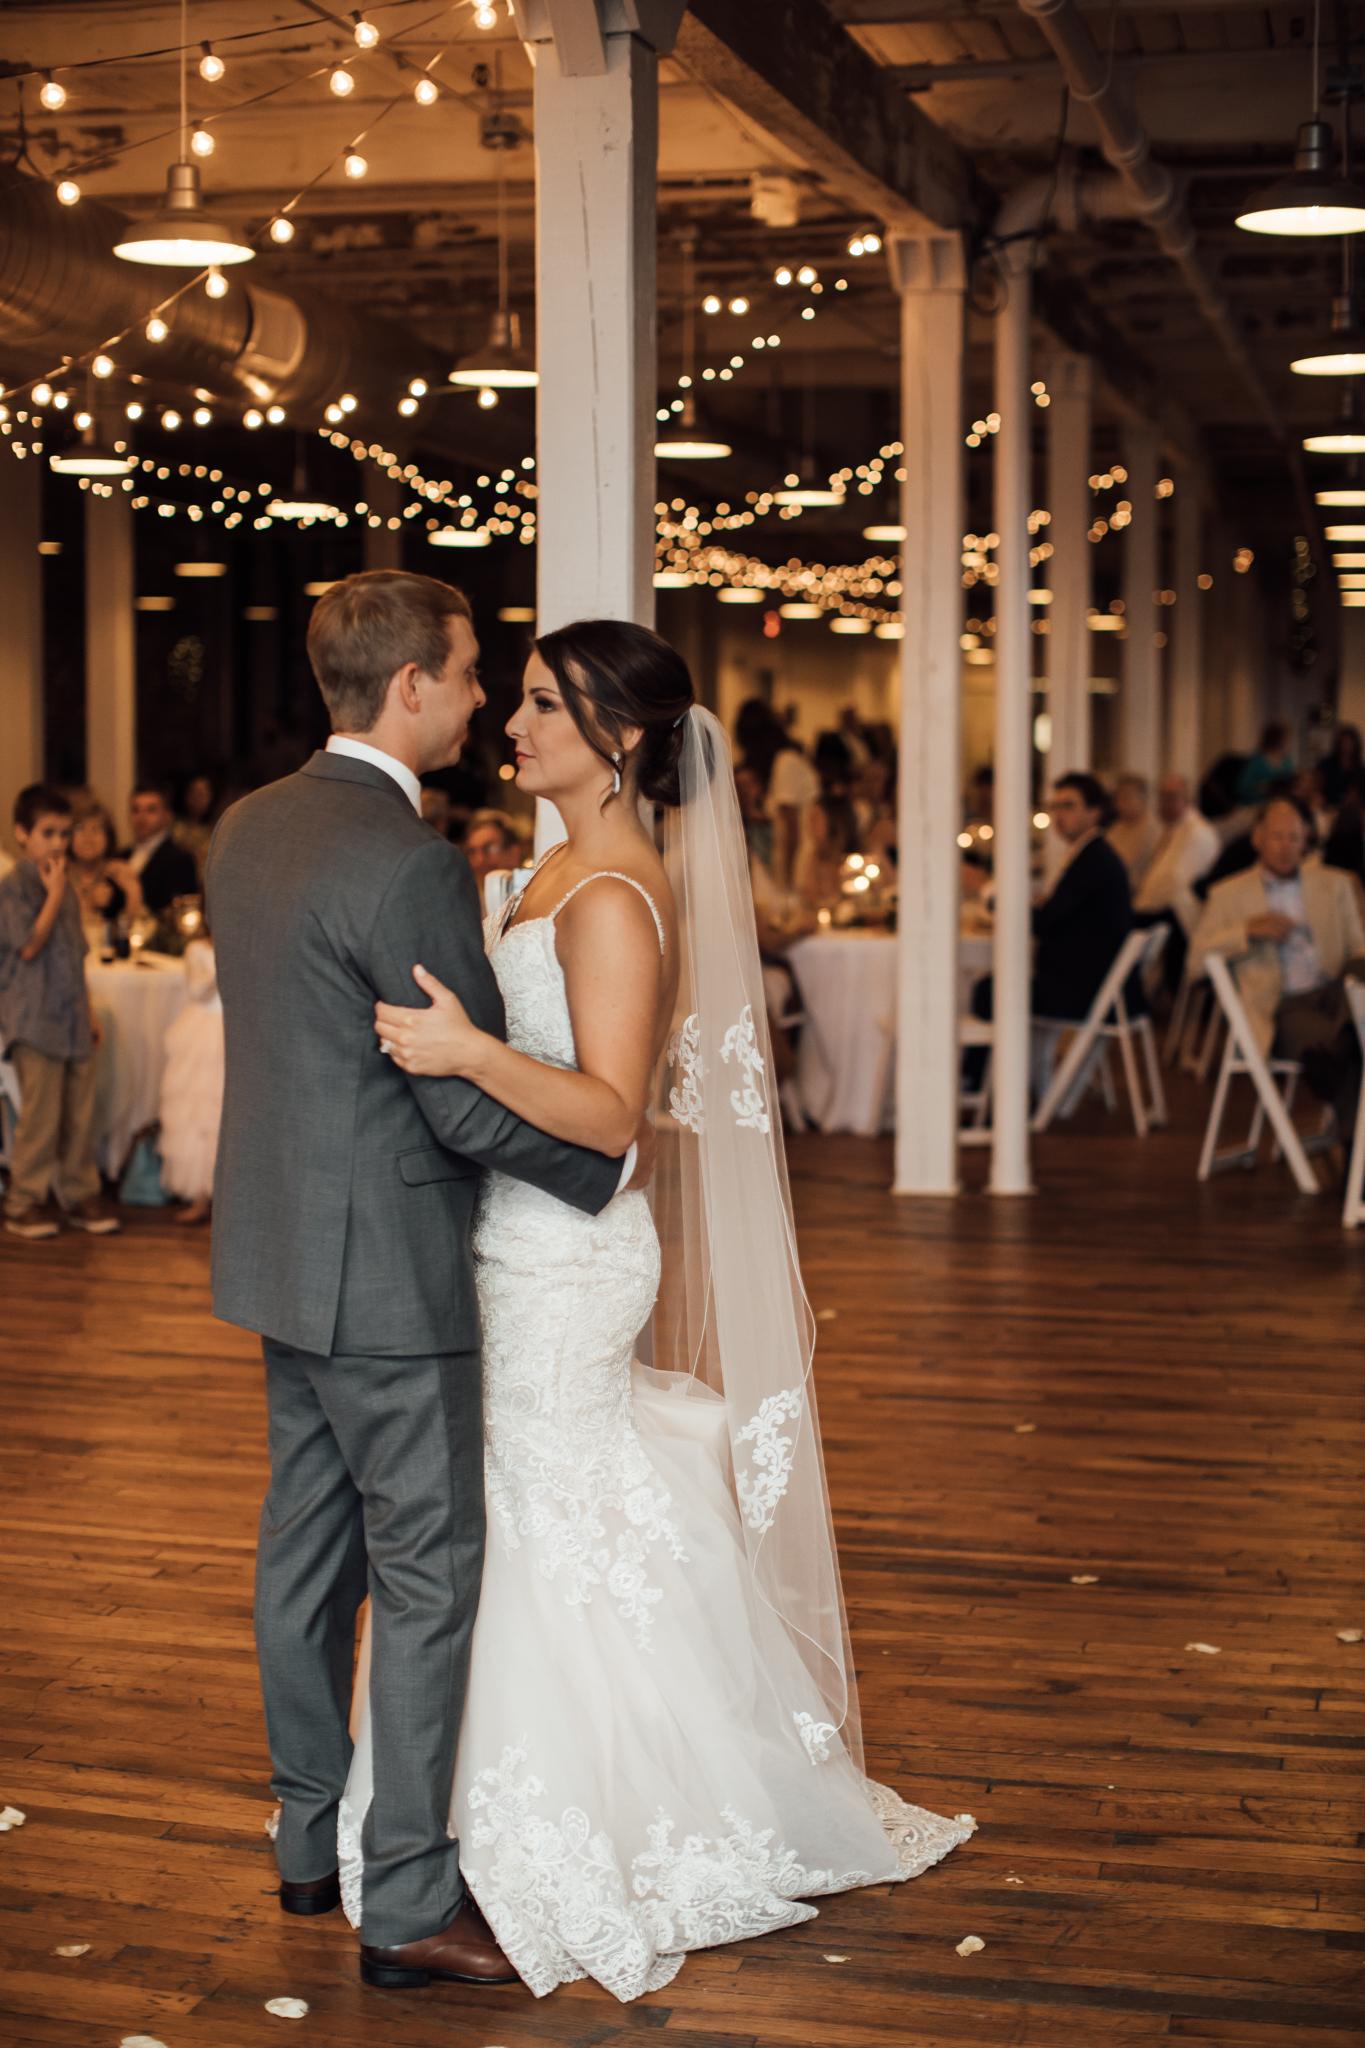 409smain-downtown-memphis-wedding-venue-thewarmtharoundyou (126 of 243).jpg